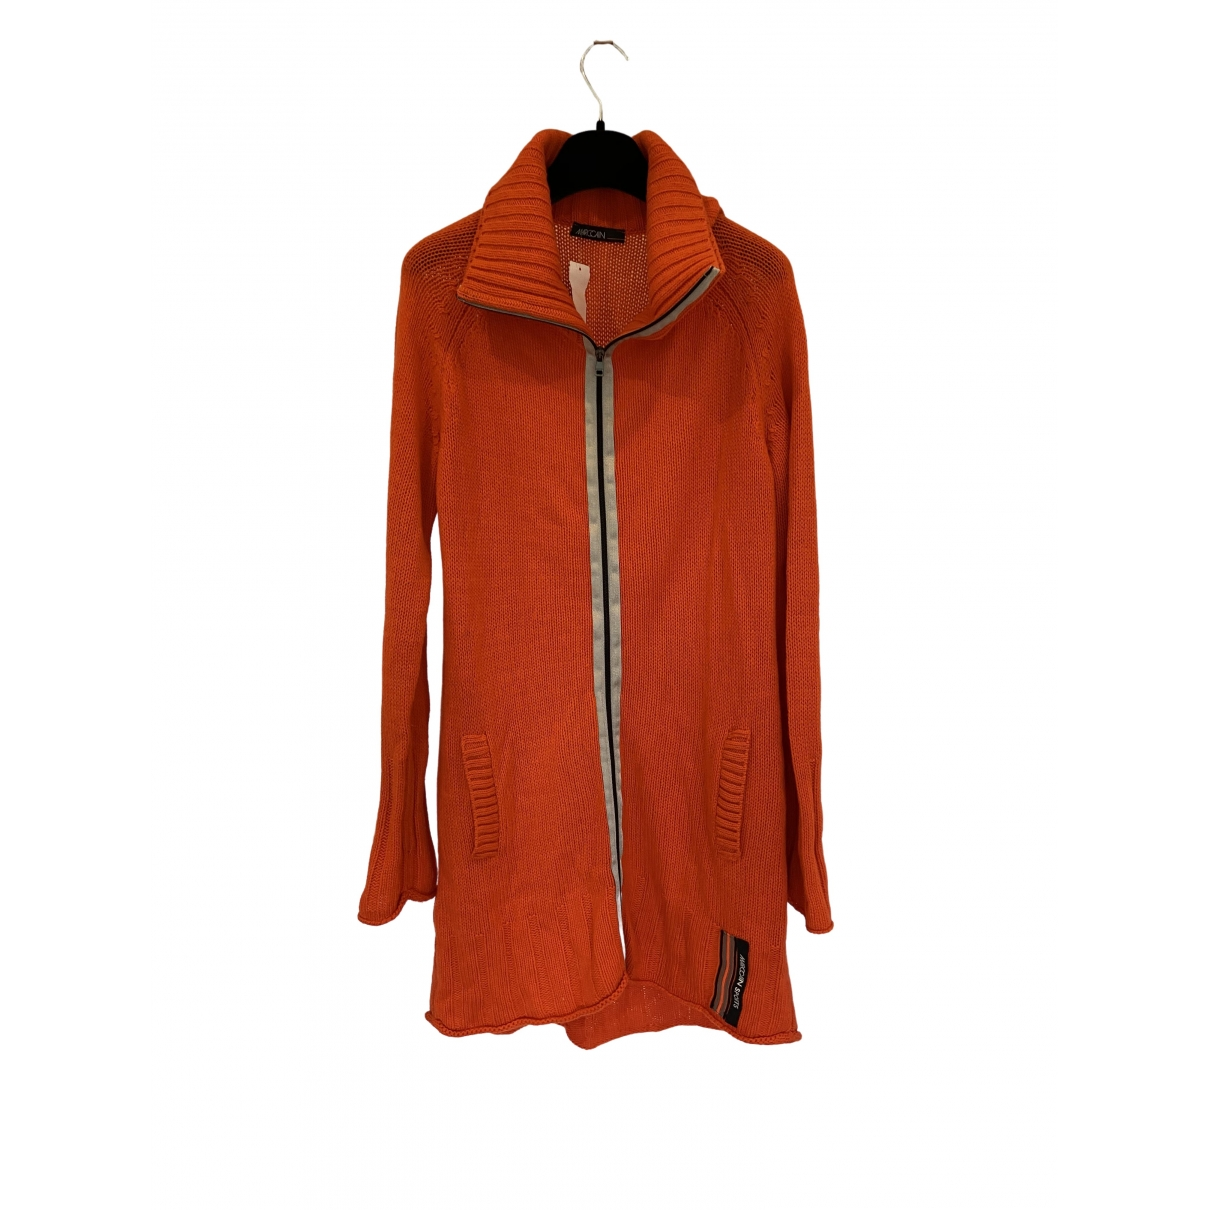 Marc Cain \N Orange Wool jacket for Women 4 0-5